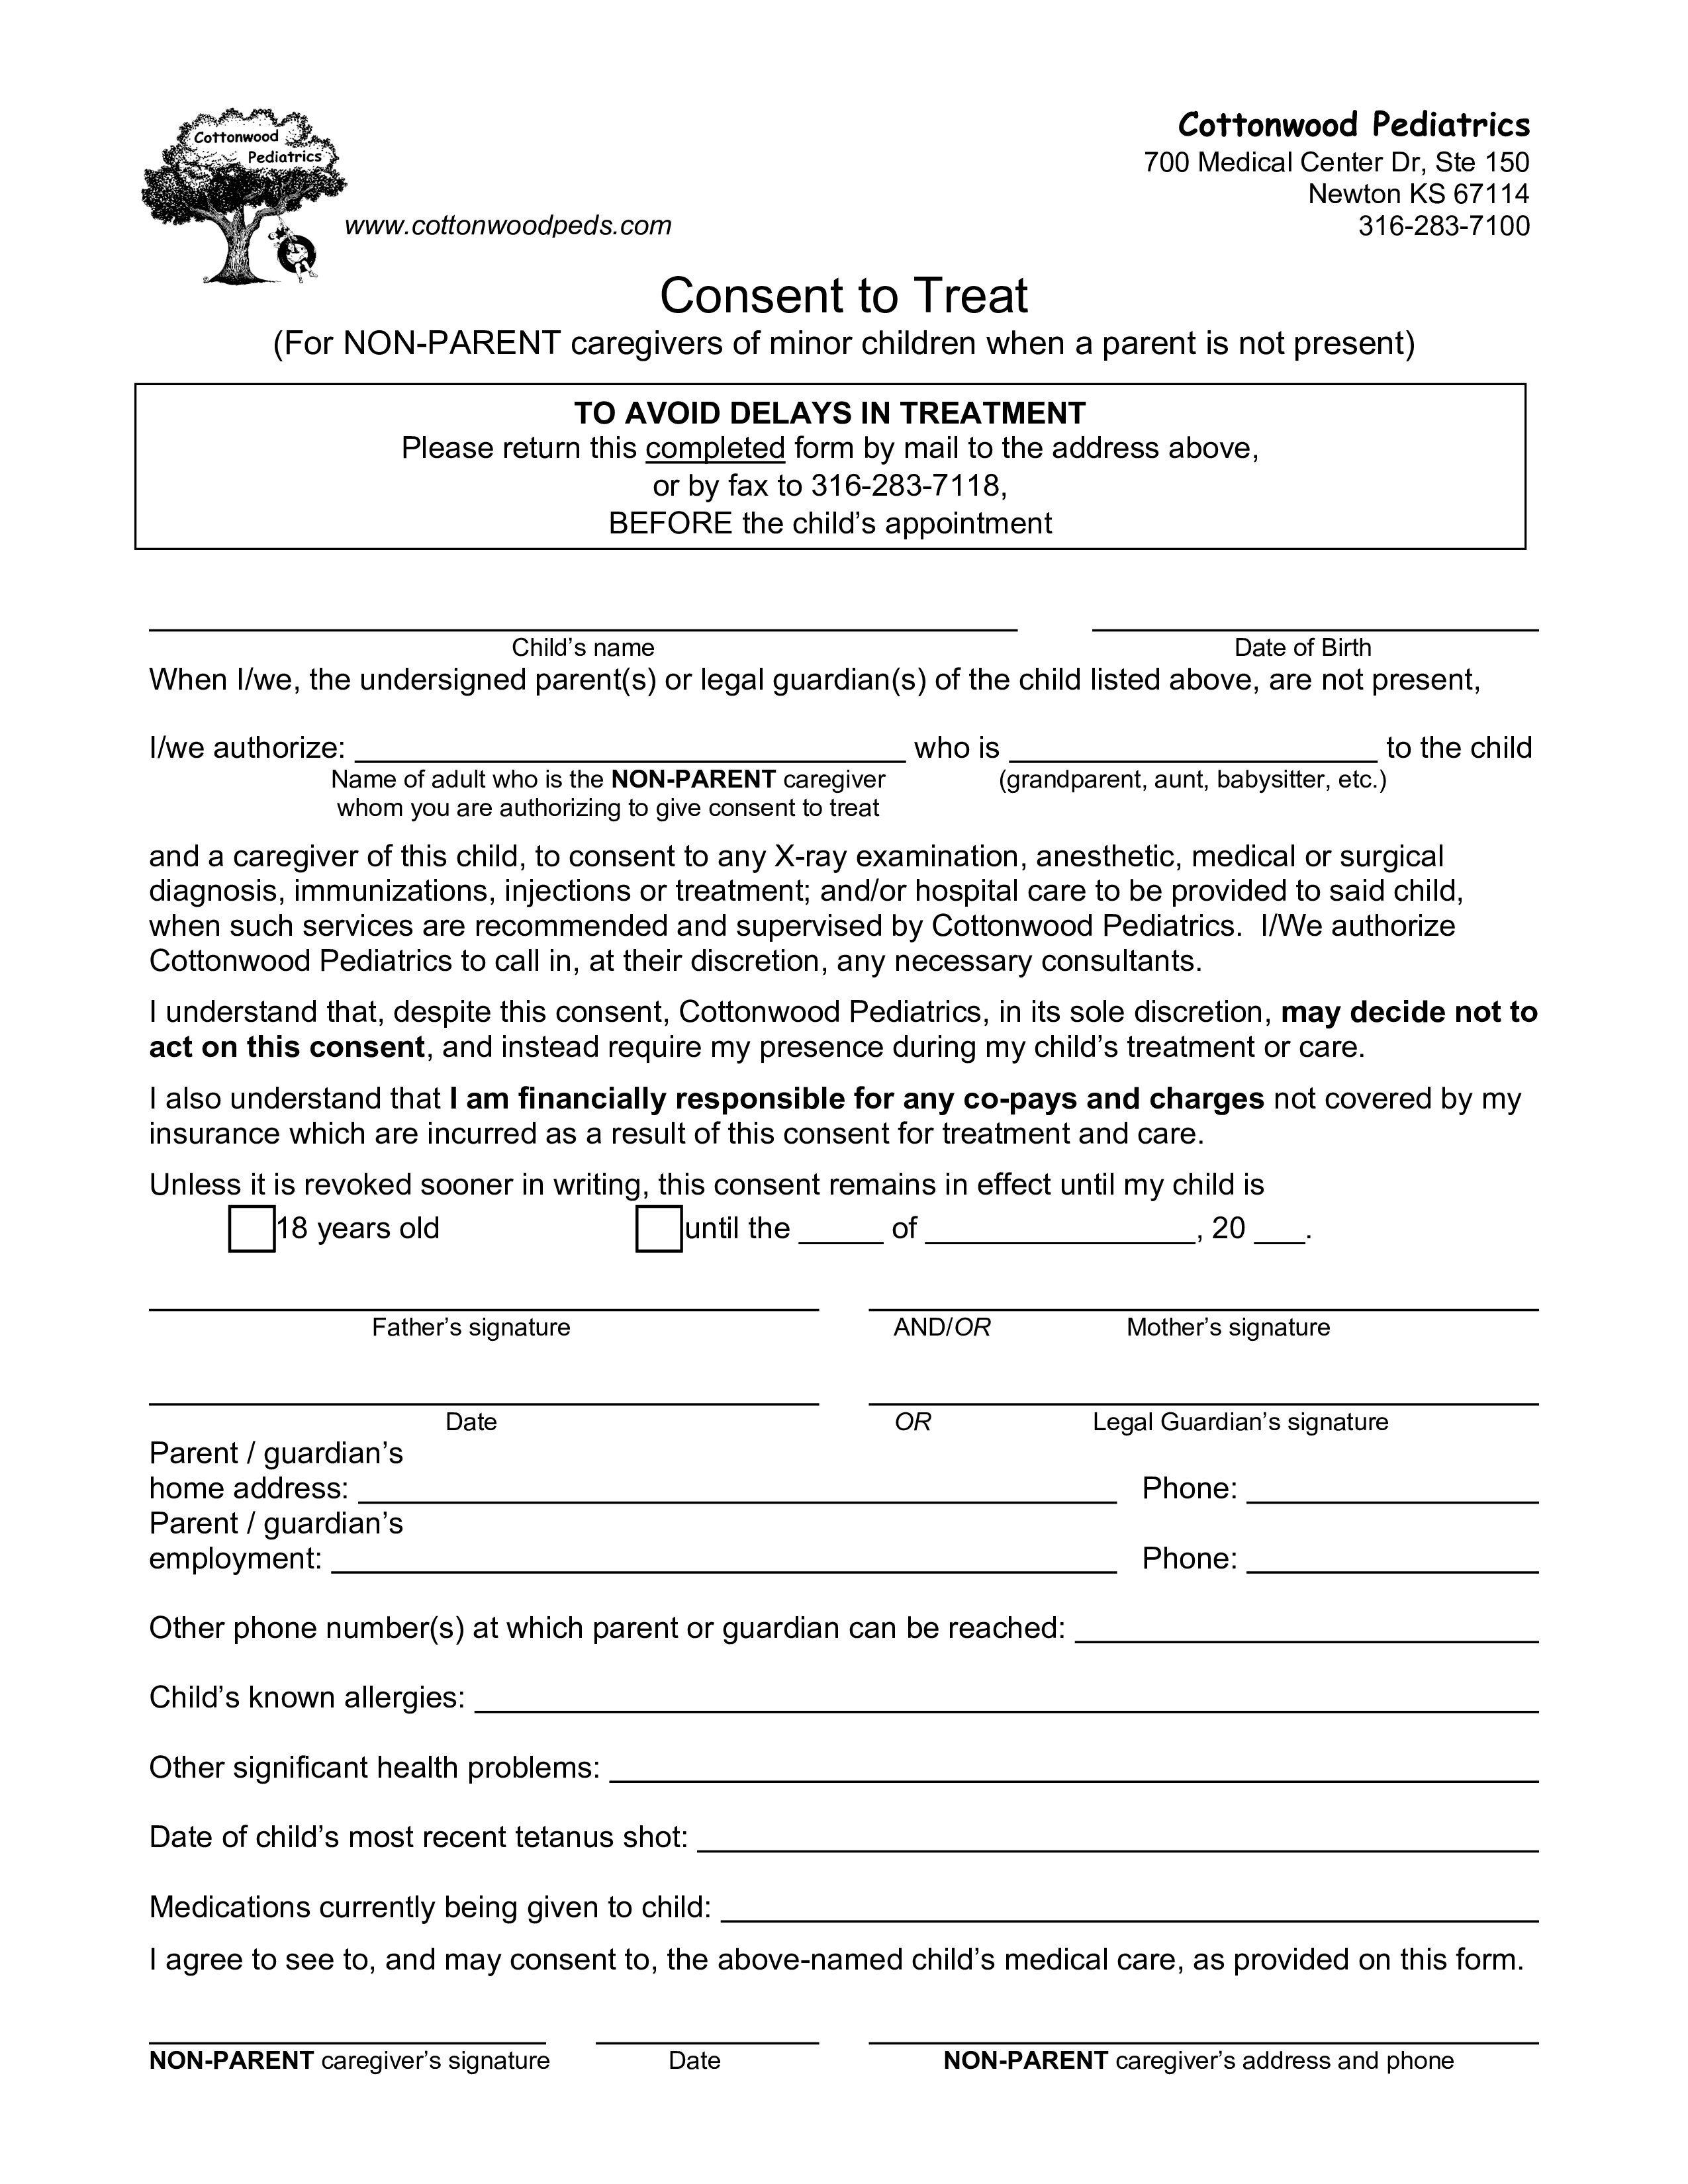 002 Surprising Medical Consent Form Template Idea  Templates FreeFull